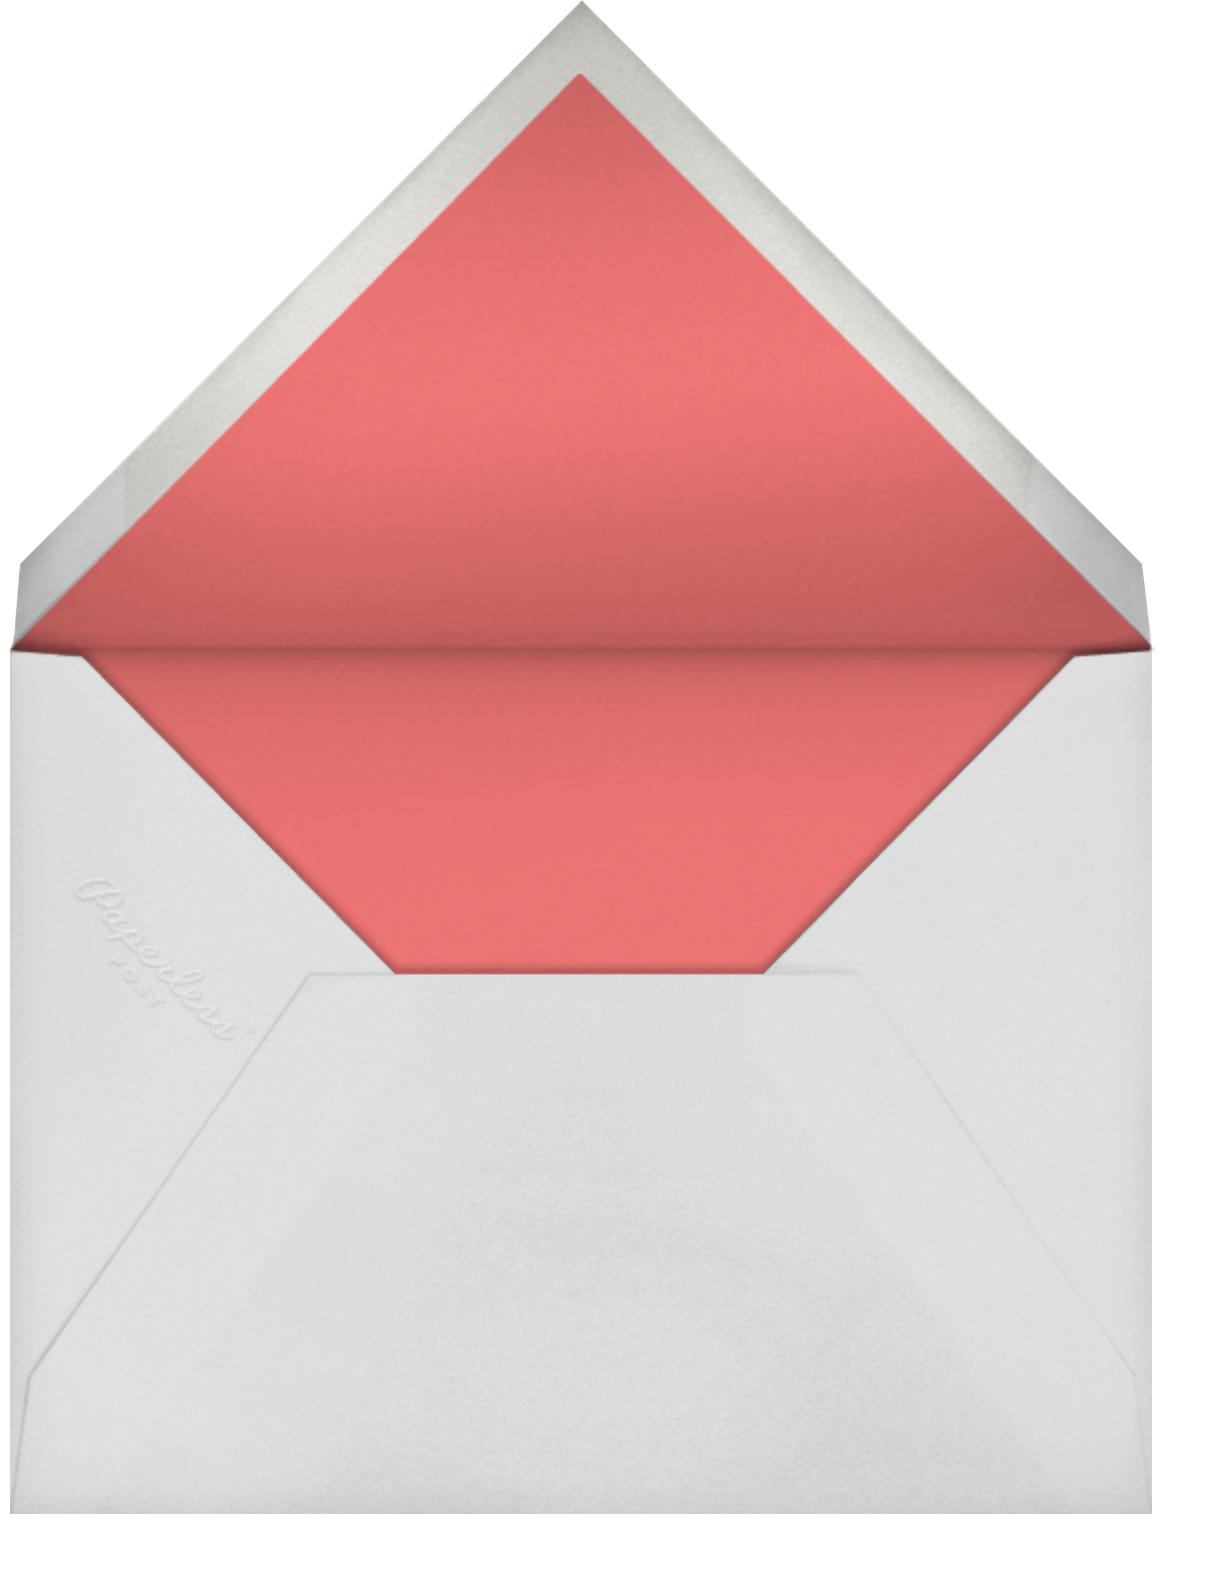 Jemma Street (Stationery) - Coral - kate spade new york - General - envelope back